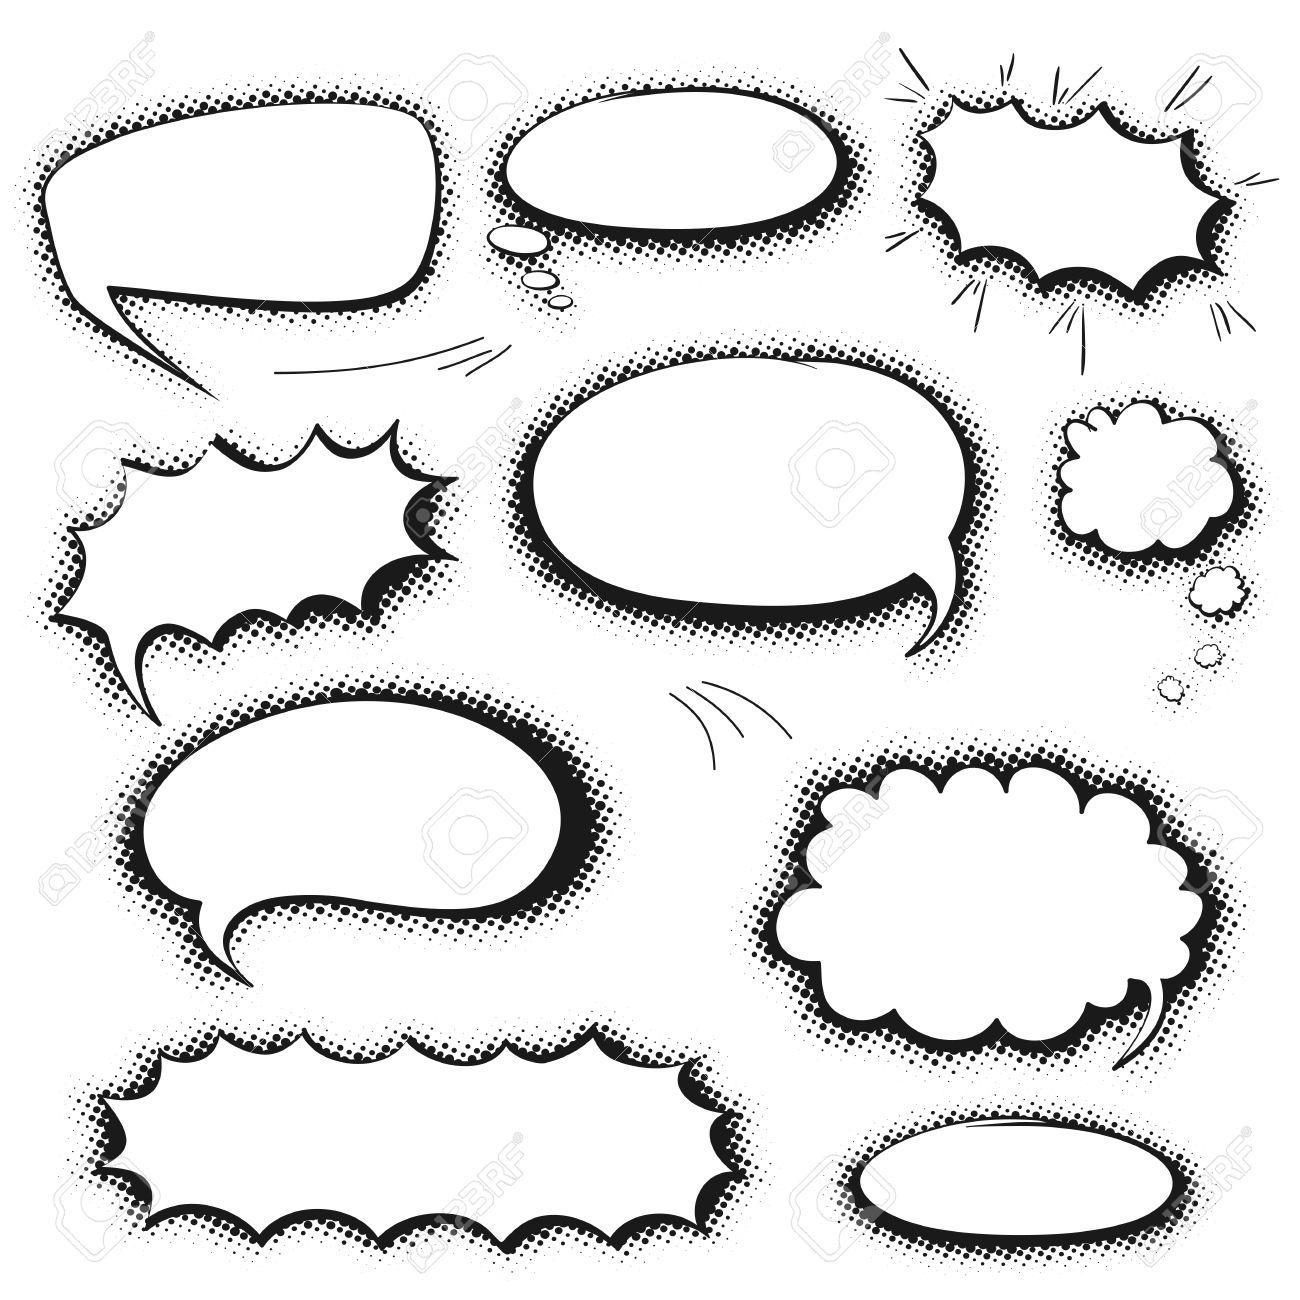 Set Of Empty Graphic Black And White Comics Speech Bubbles, Vector ...